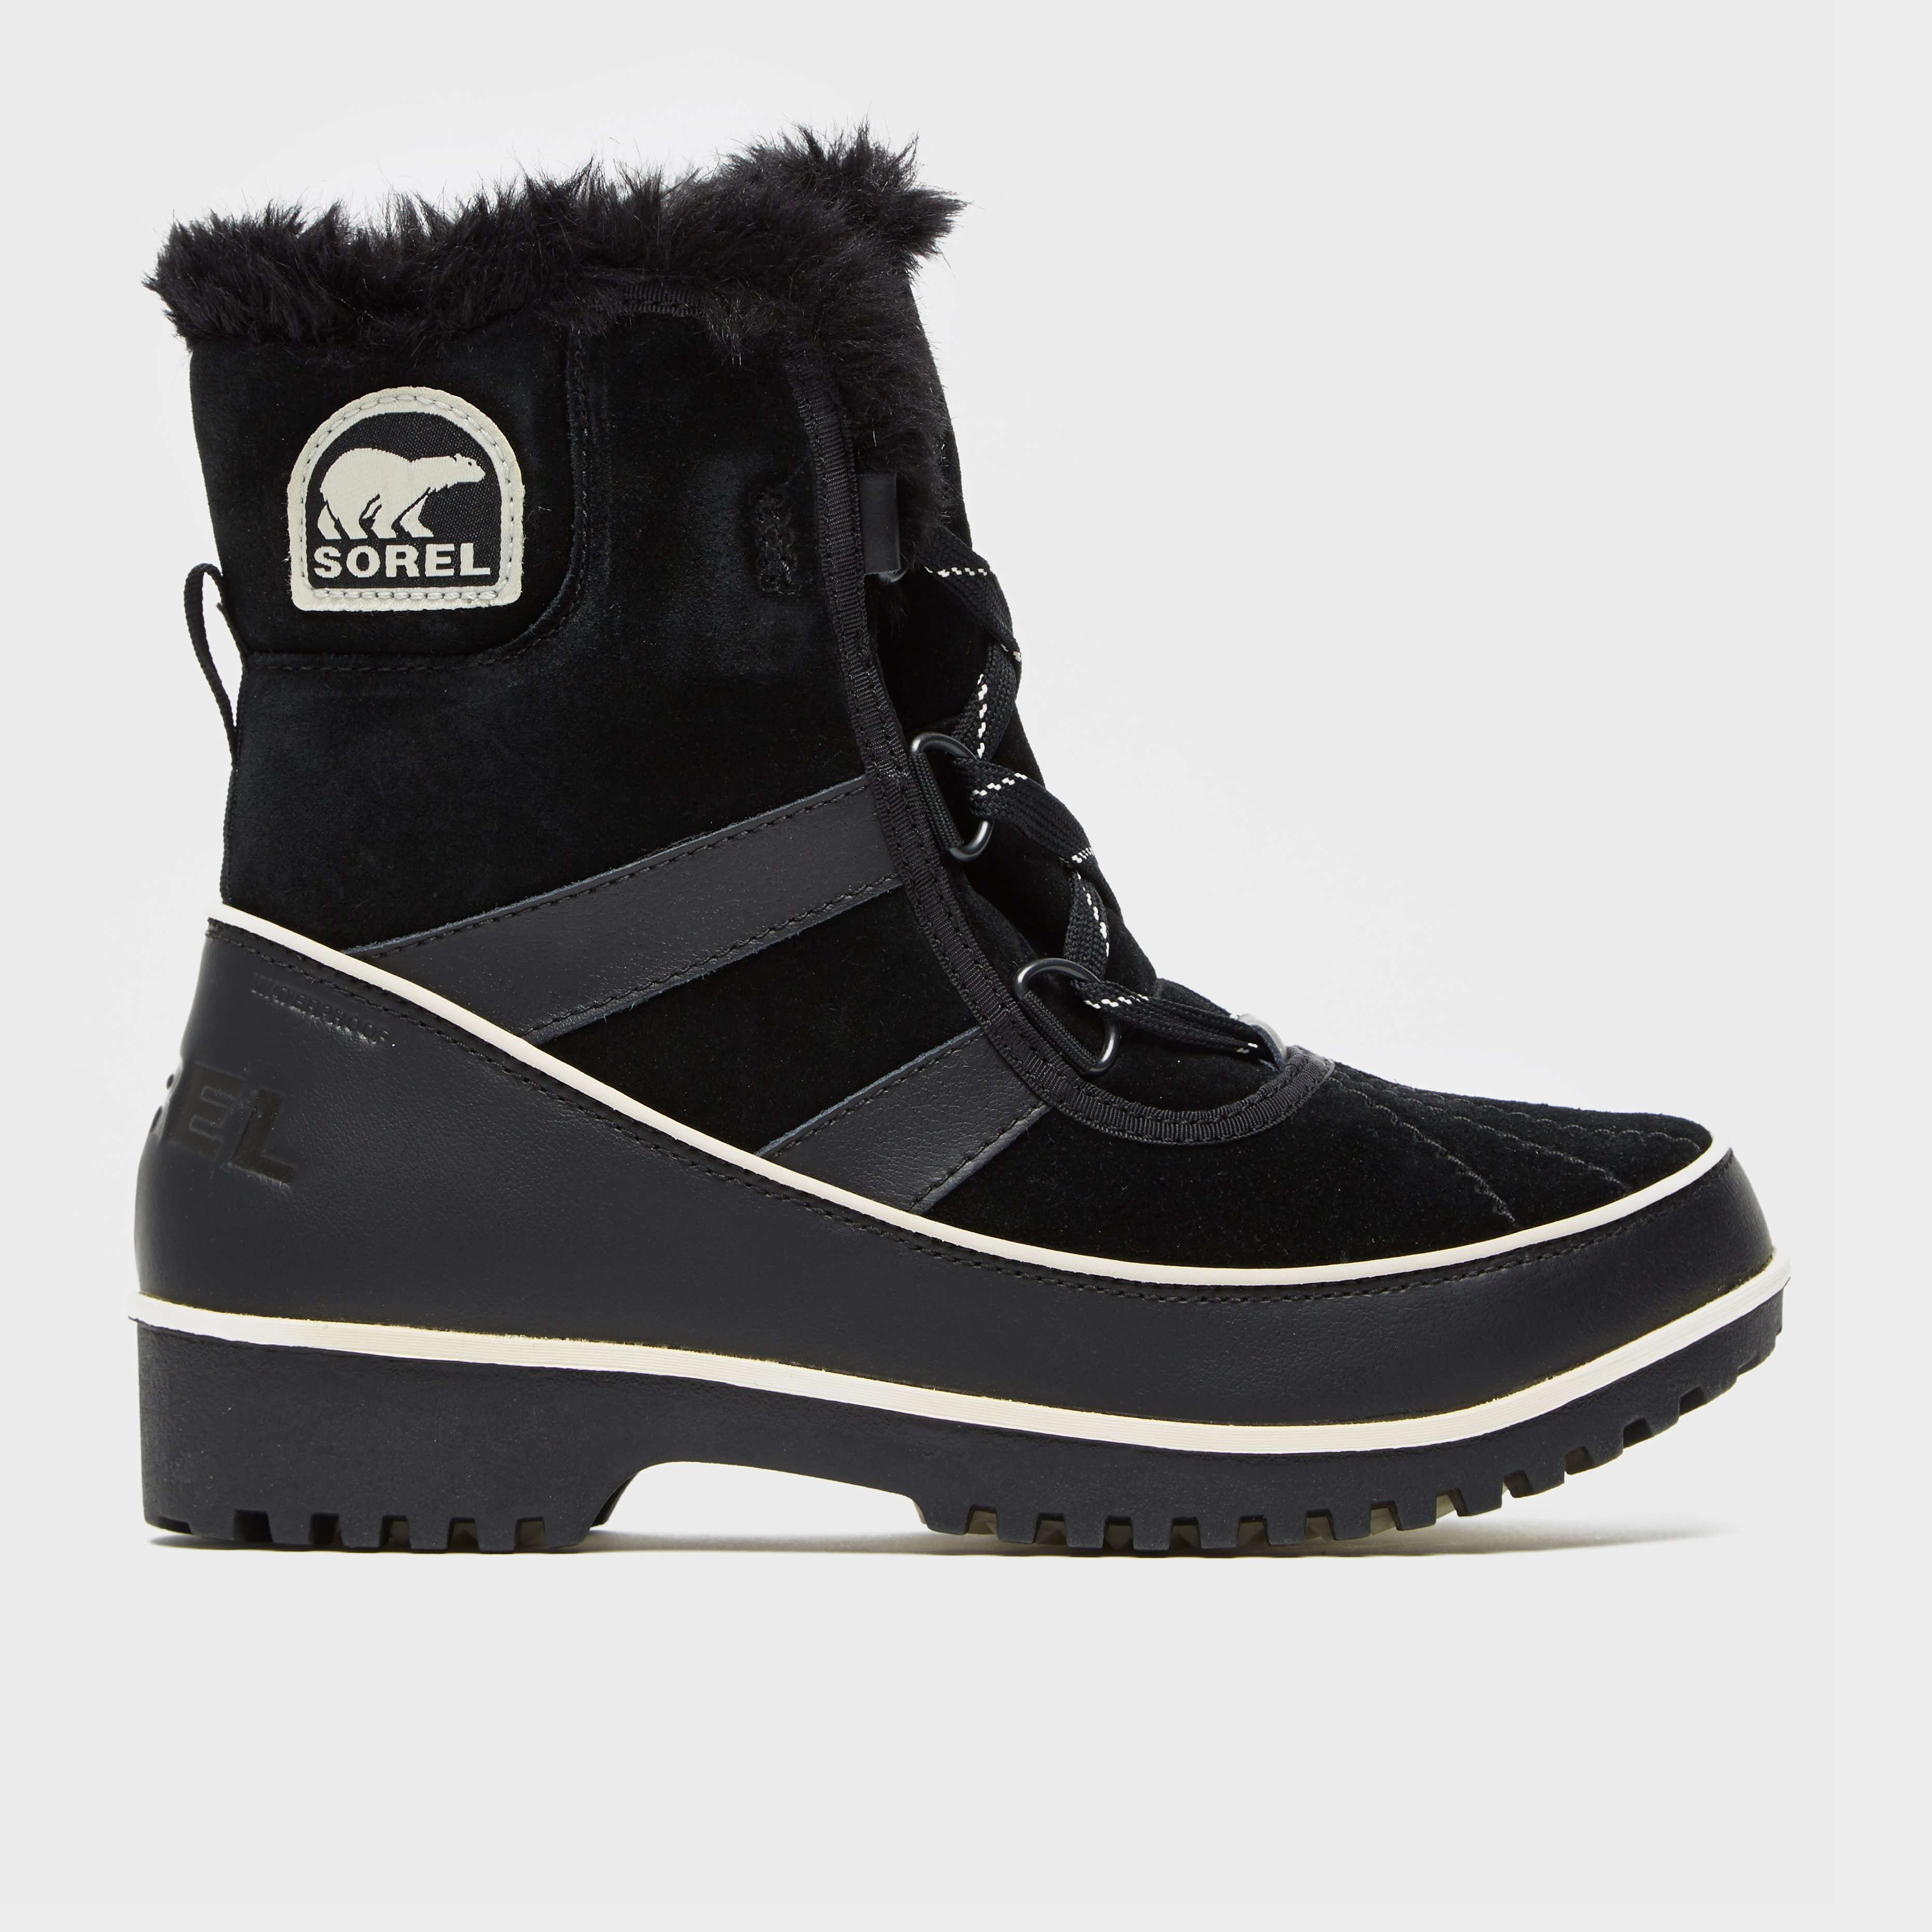 SOREL Women's Tivoli™ II Boots